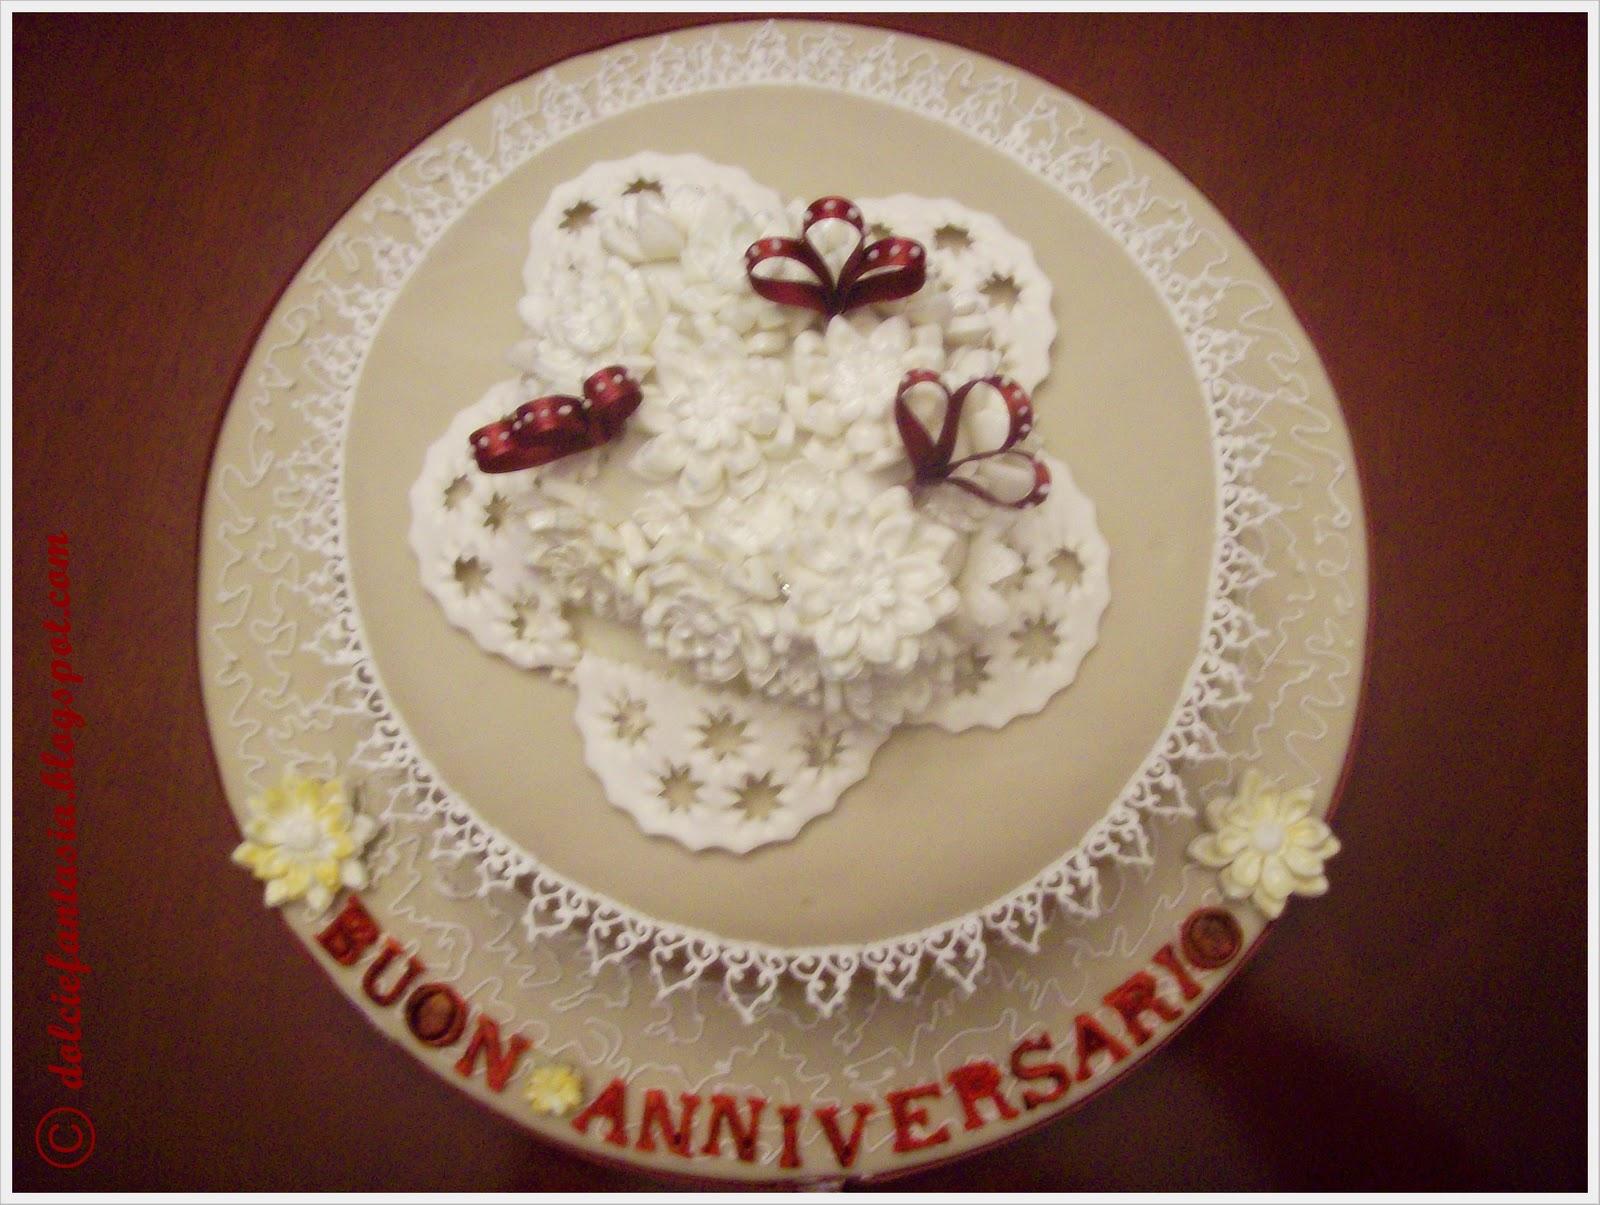 Auguri Anniversario Matrimonio Foto : Desikudiyaan auguri anniversario